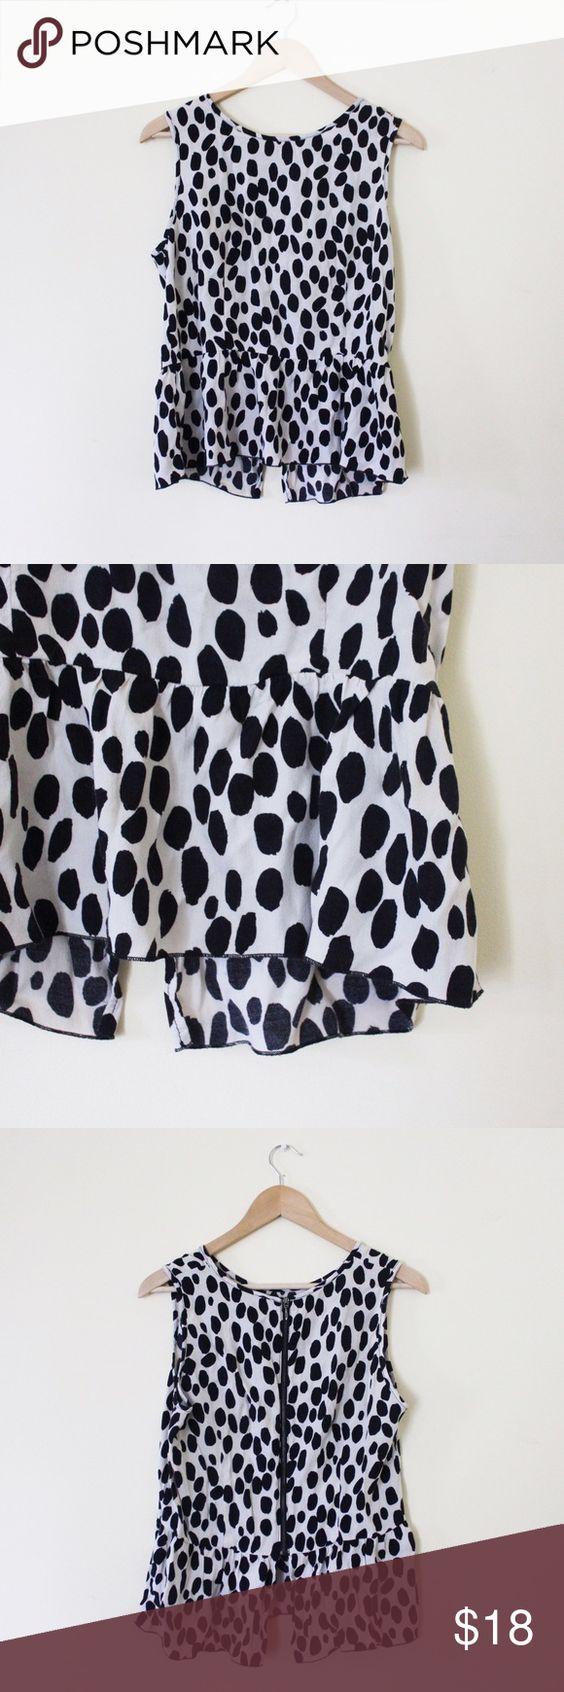 Polka dot blouse Peplum polka dot blouse. Back zipper. Good condition! Size 12, but closer to an 8/10. H&M Tops Tank Tops